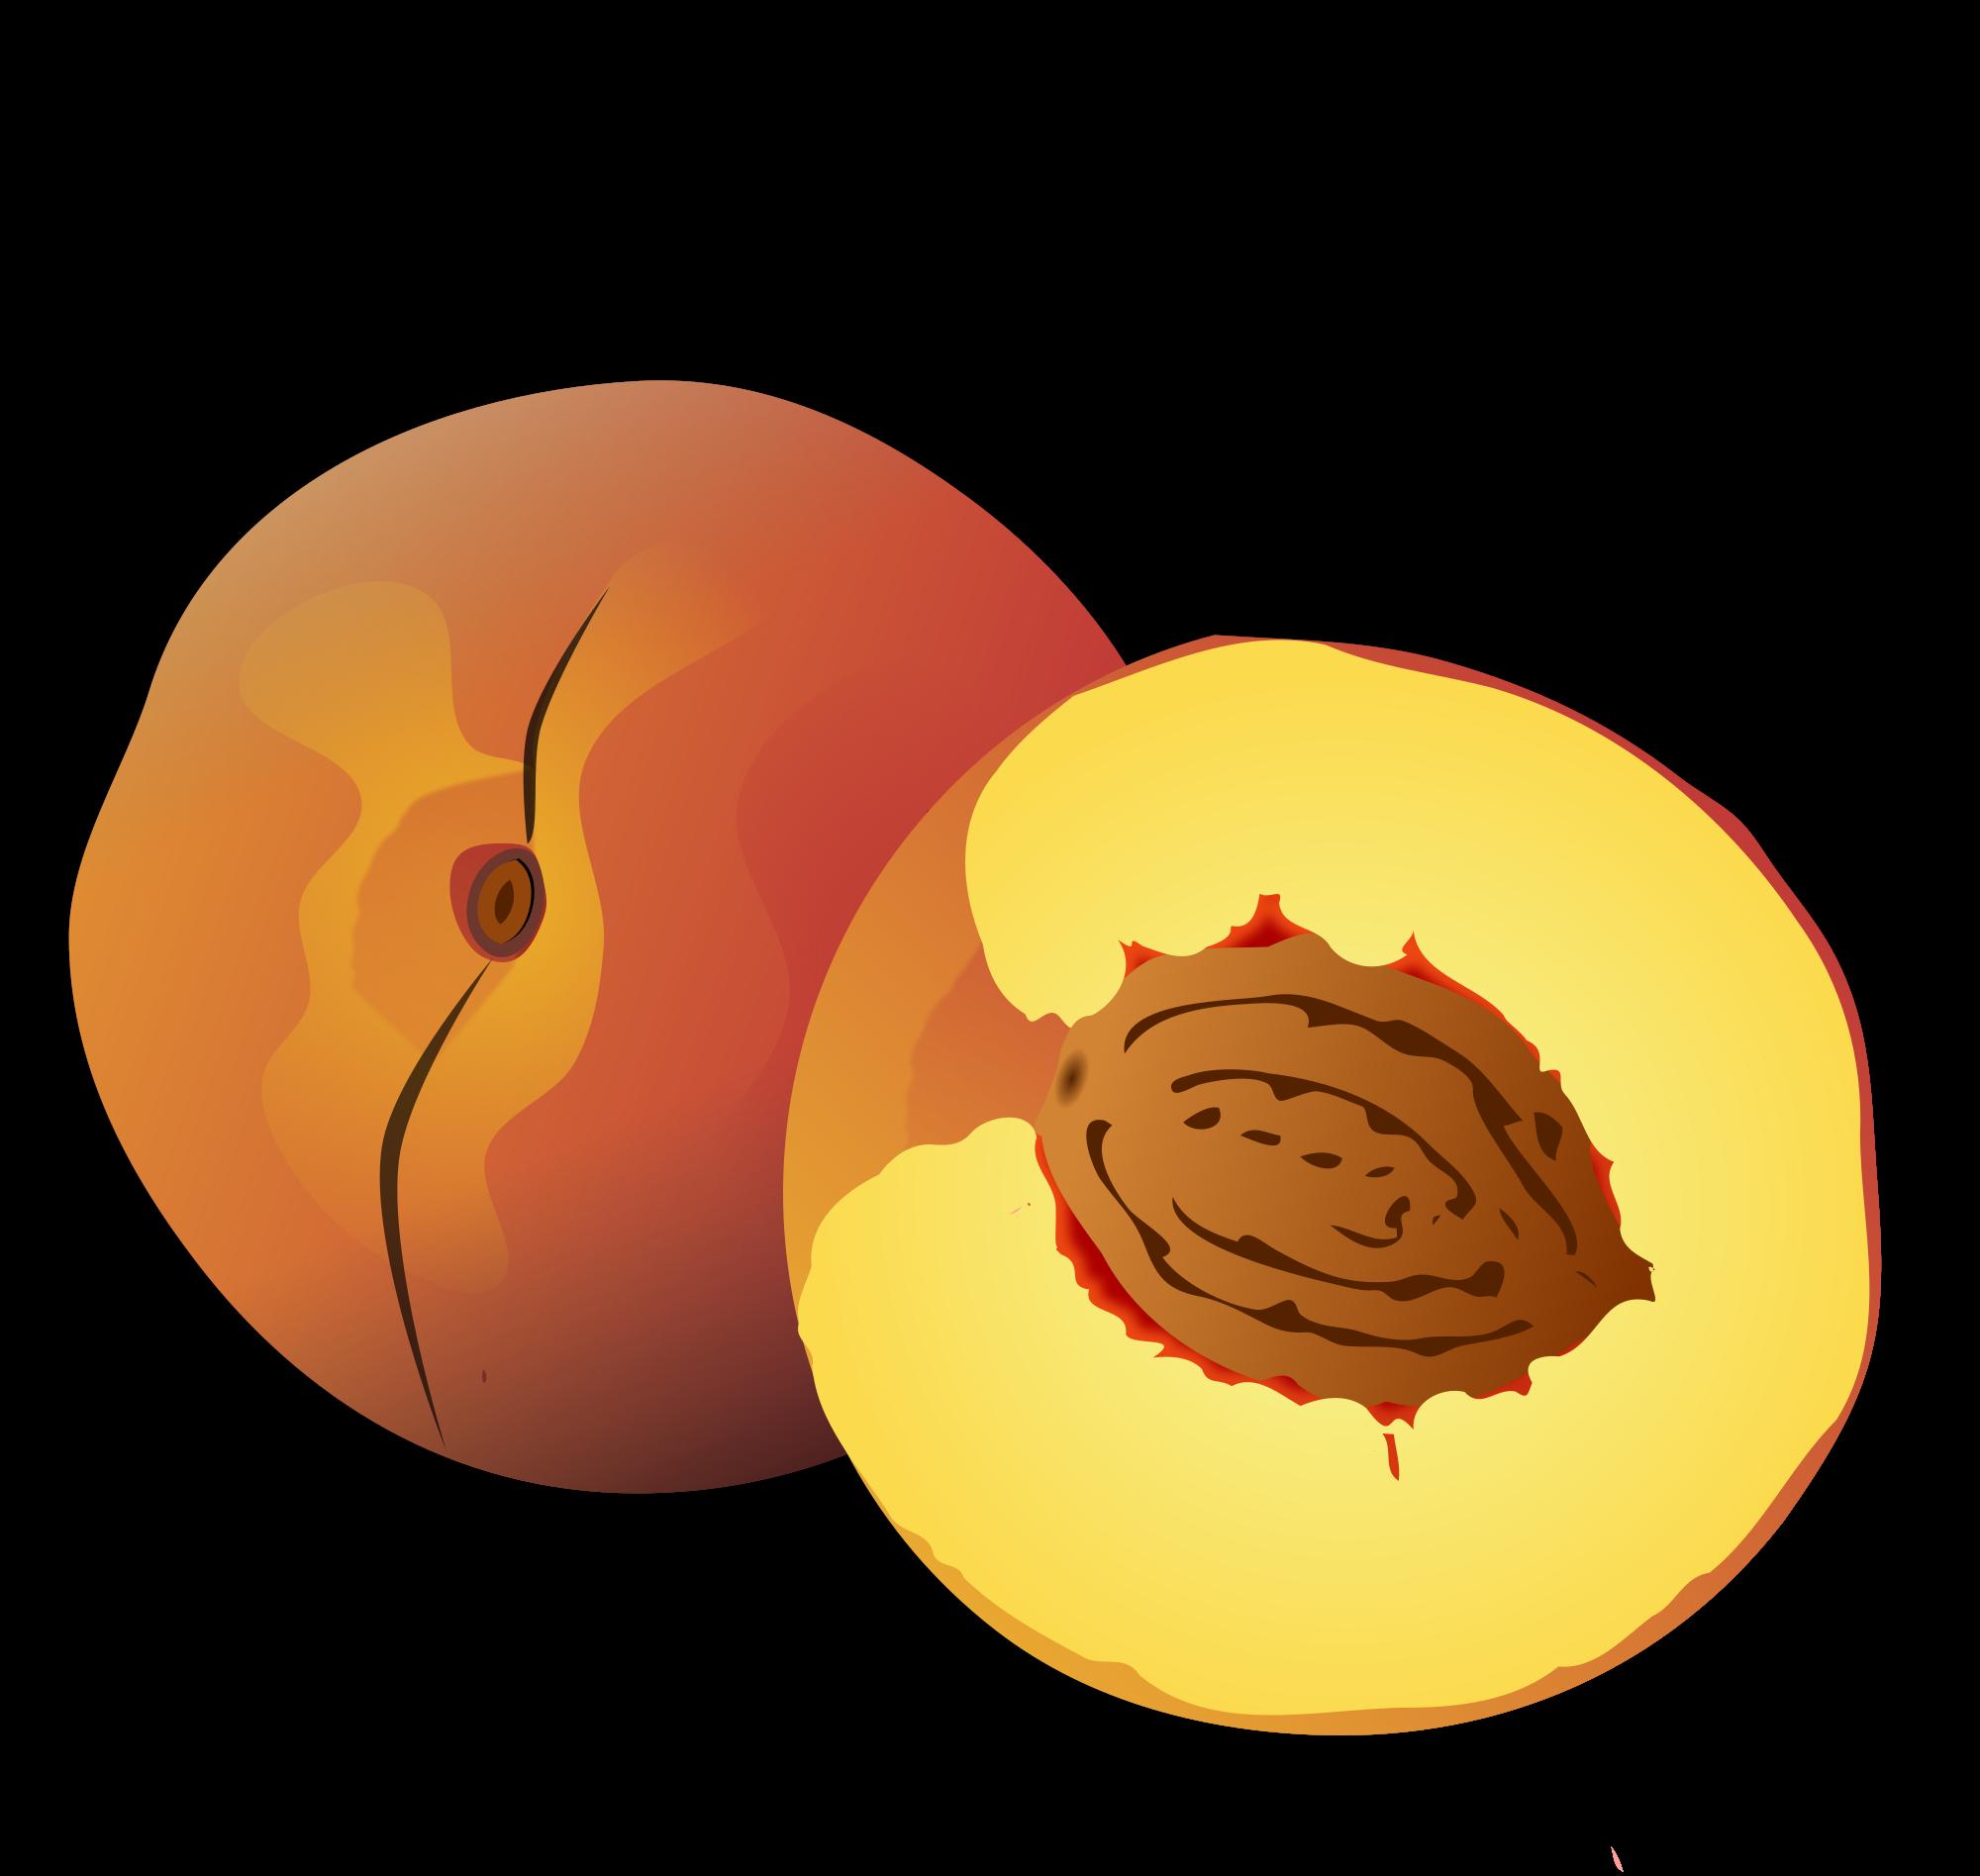 File wikimedia commons open. Peach clipart svg